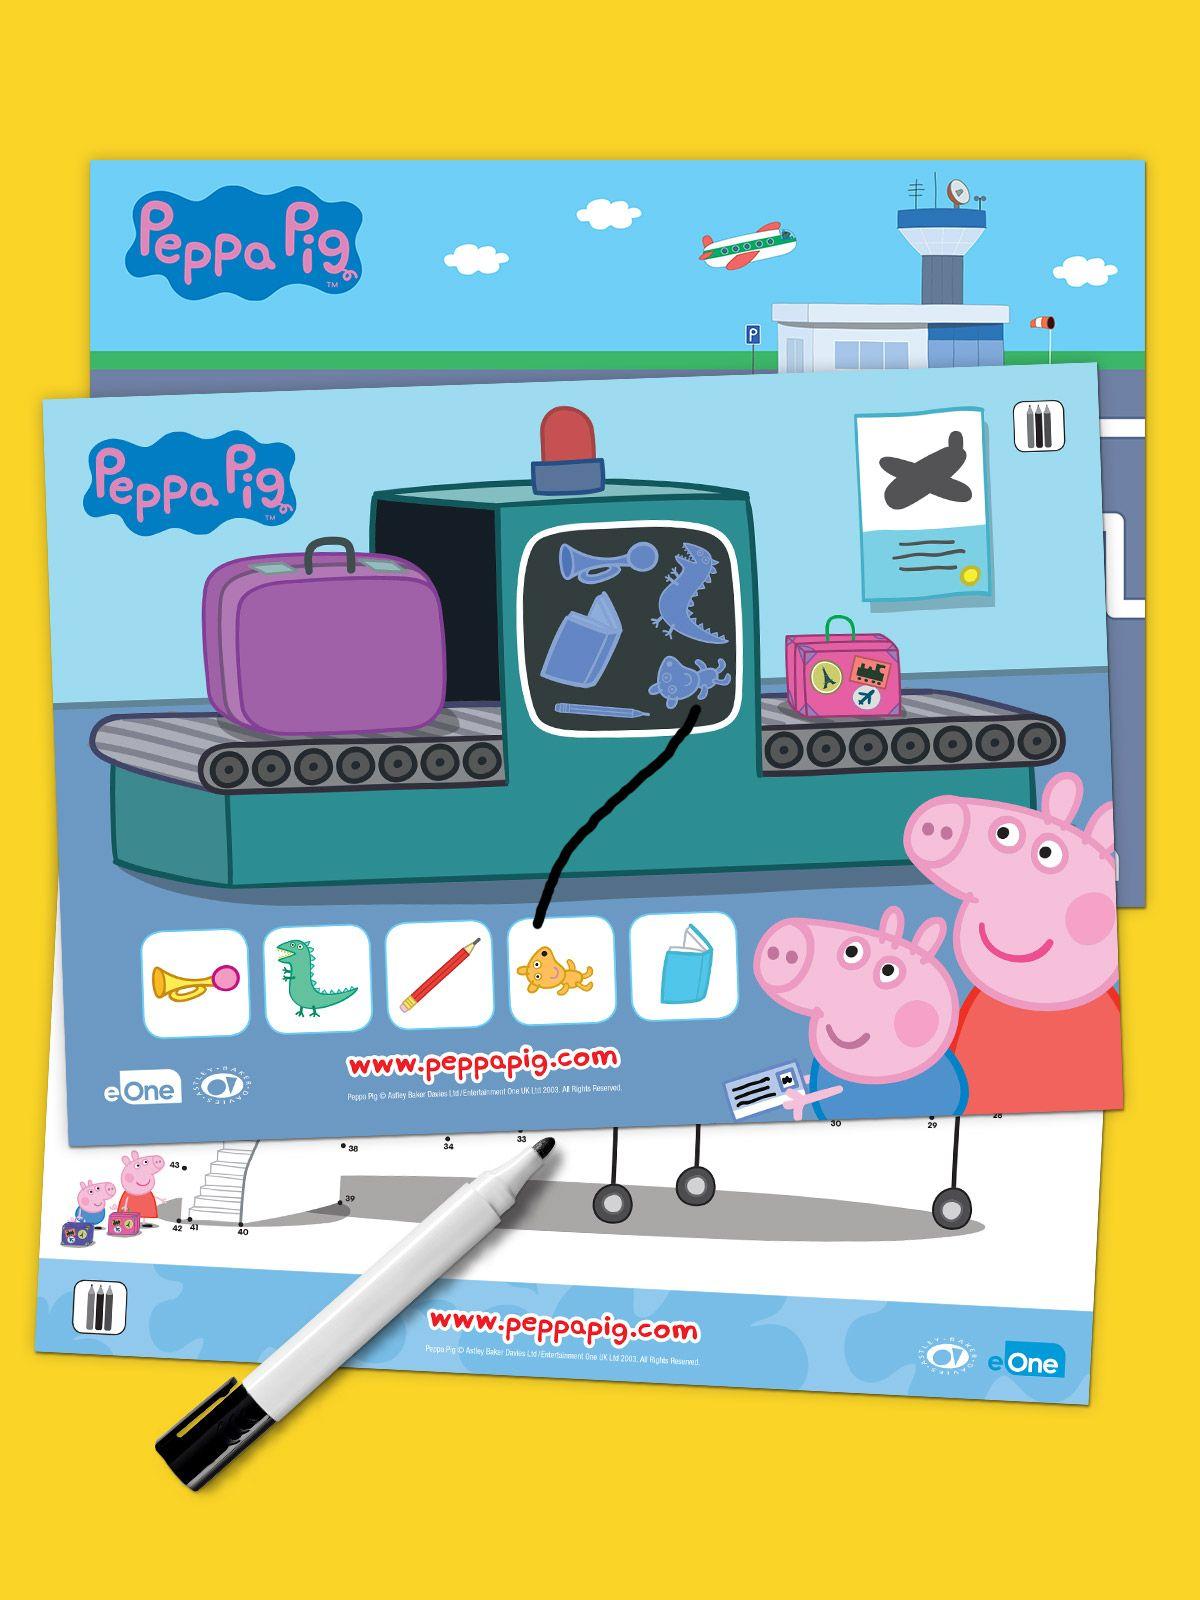 Peppa Pig Summer Travel Pack Summer travel packing